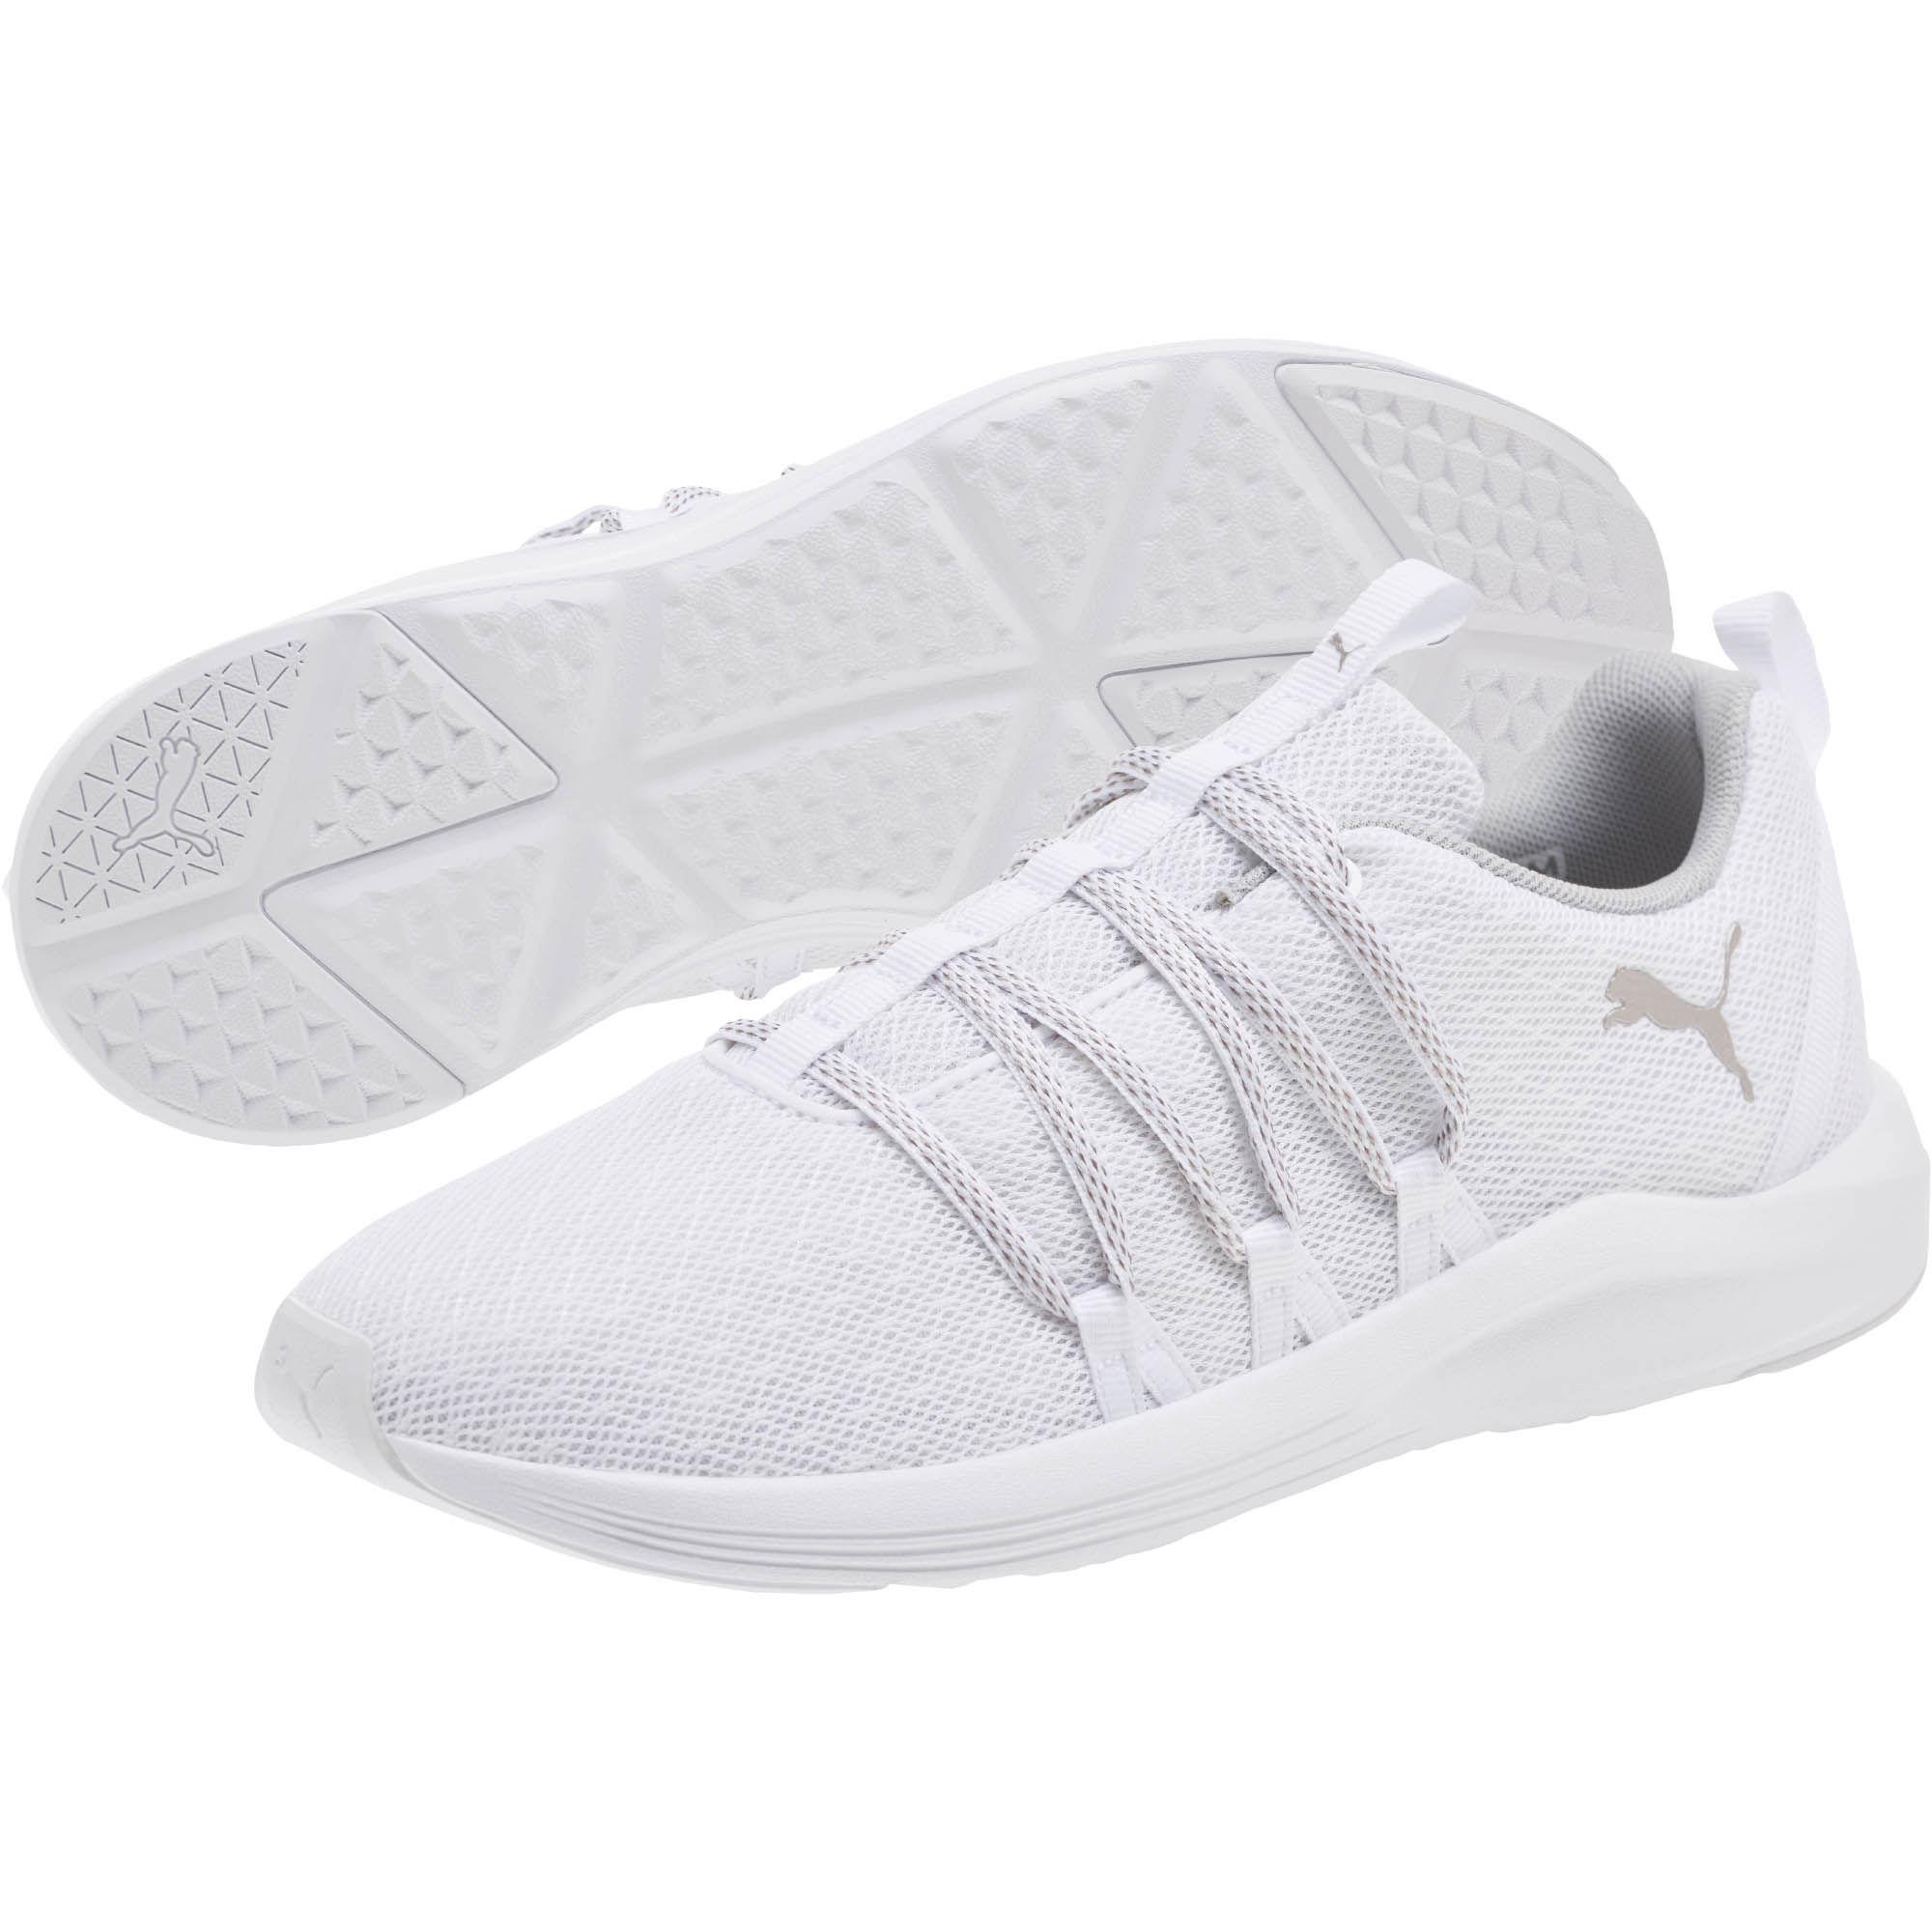 PUMA - White Prowl Alt Knit Mesh Women s Running Shoes - Lyst. View  fullscreen ed199bcae